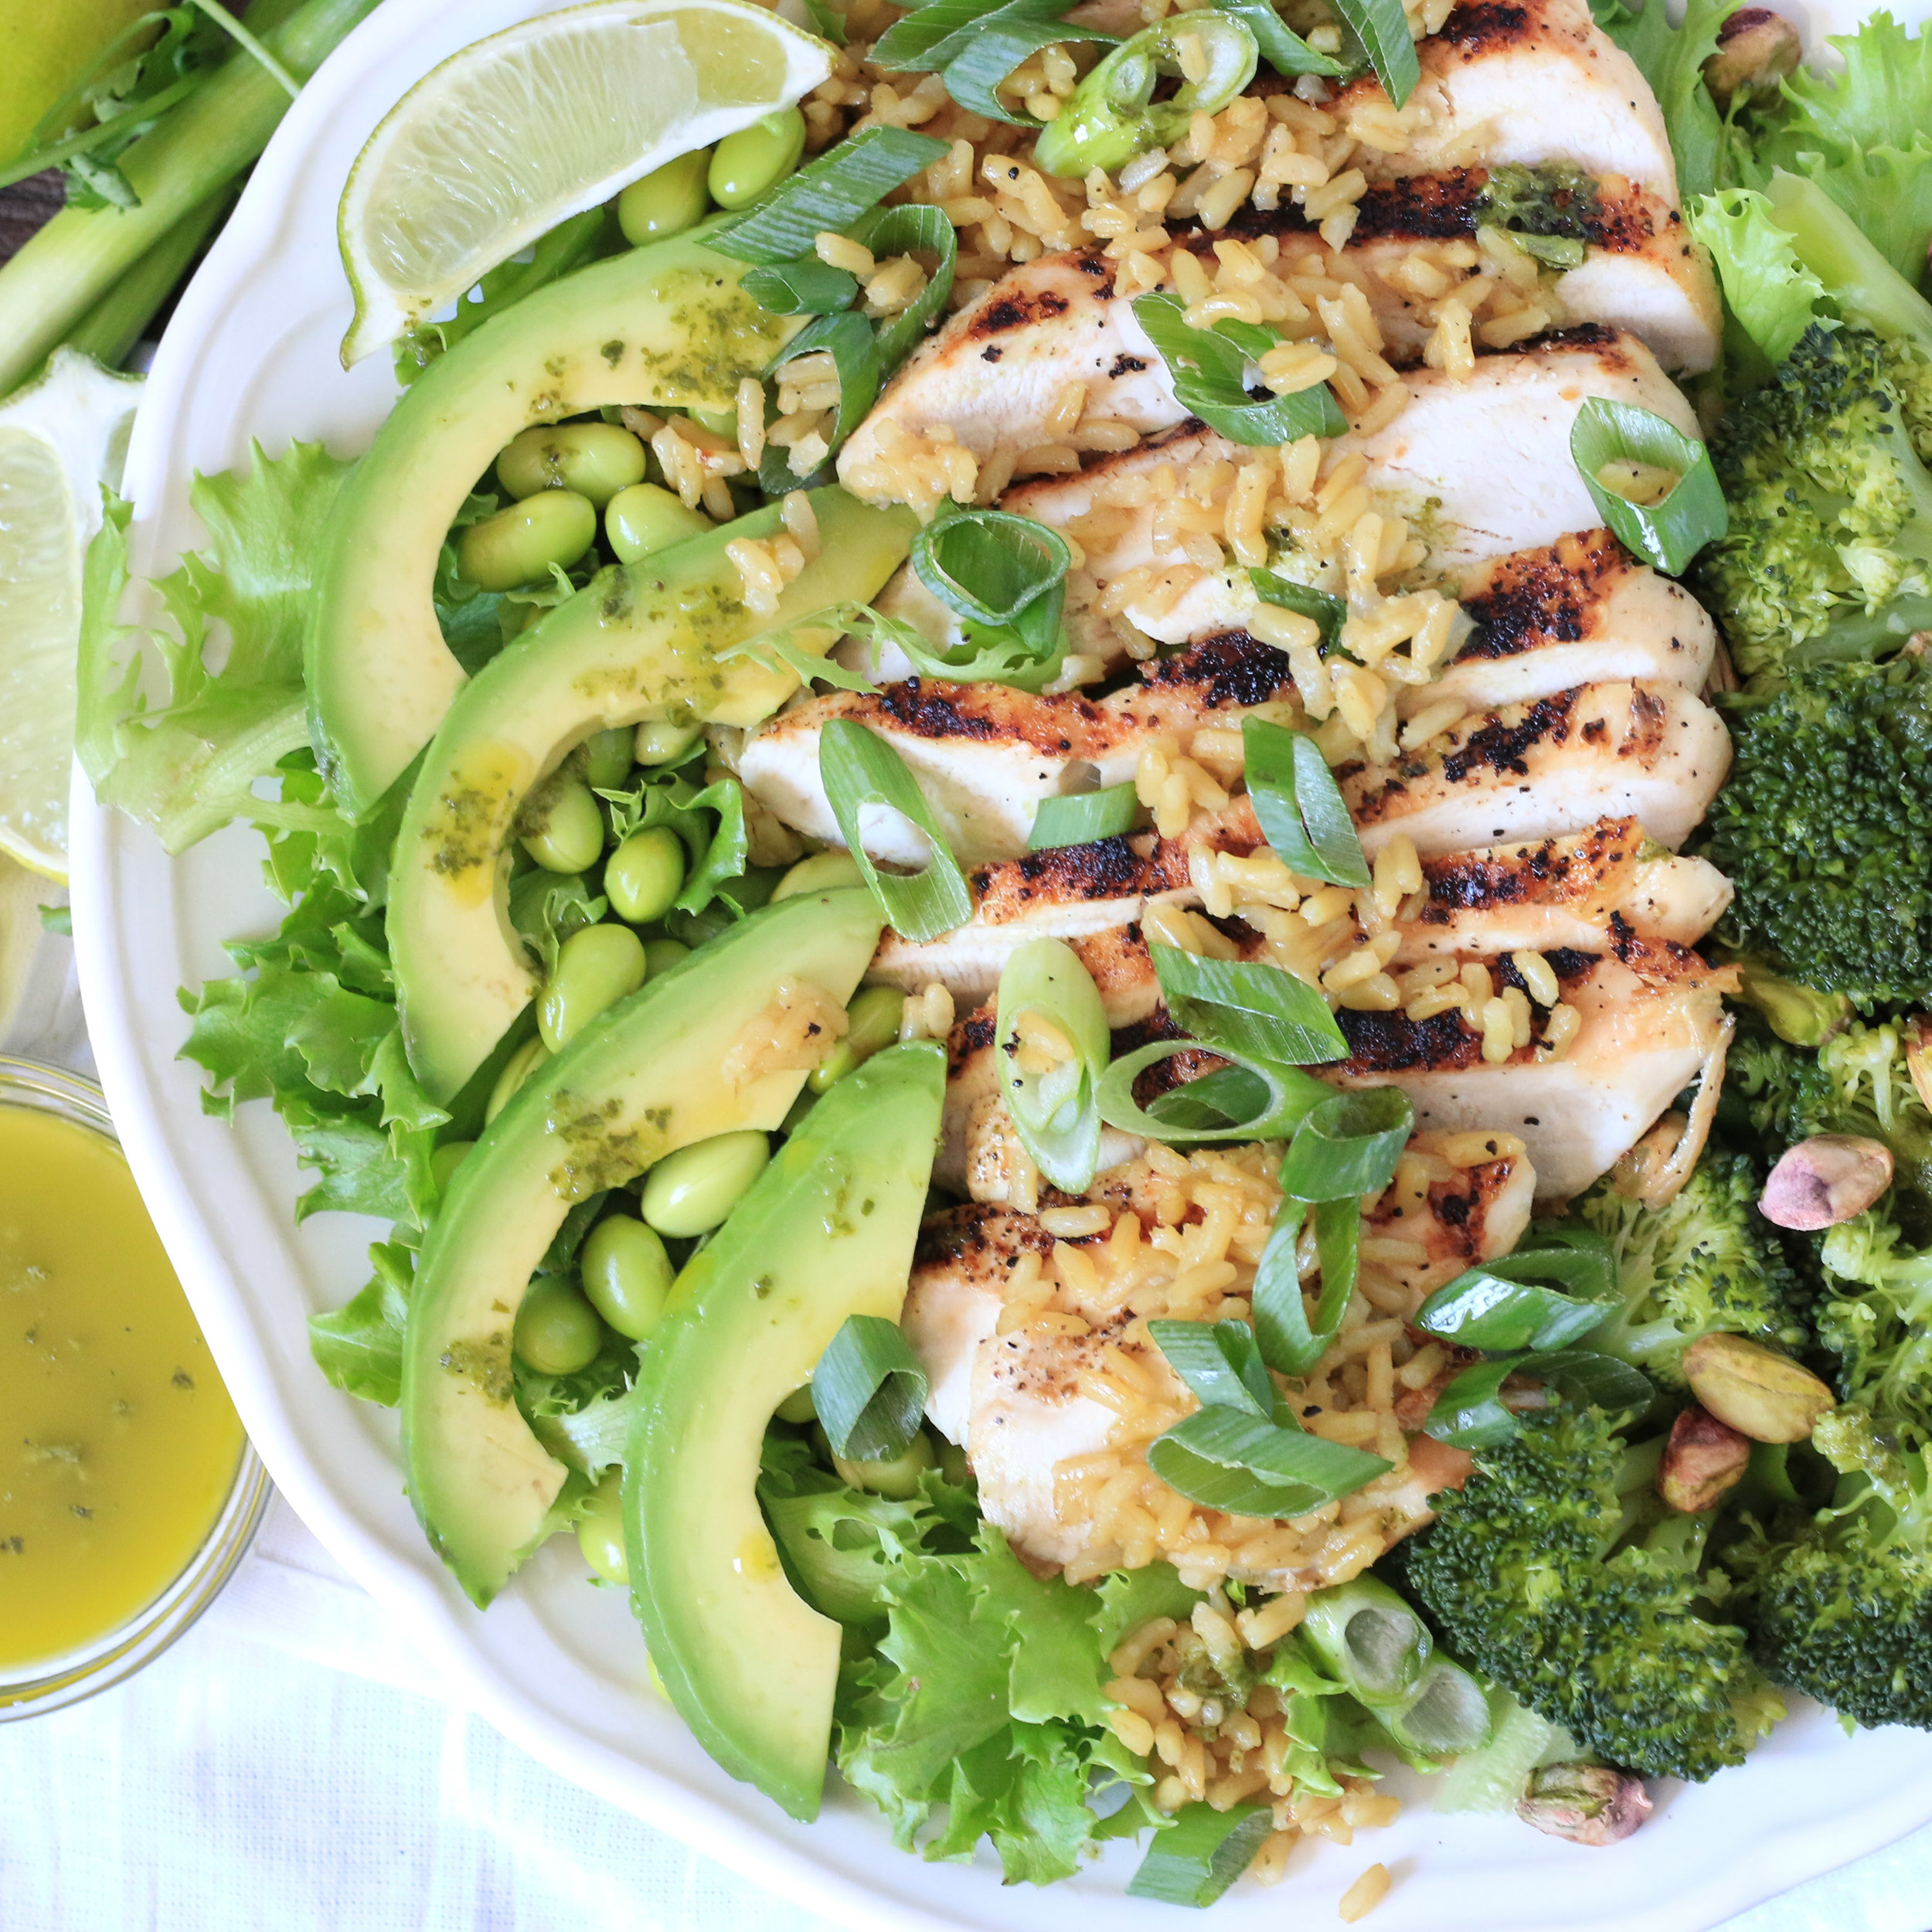 Lean Greens and Bean Salad